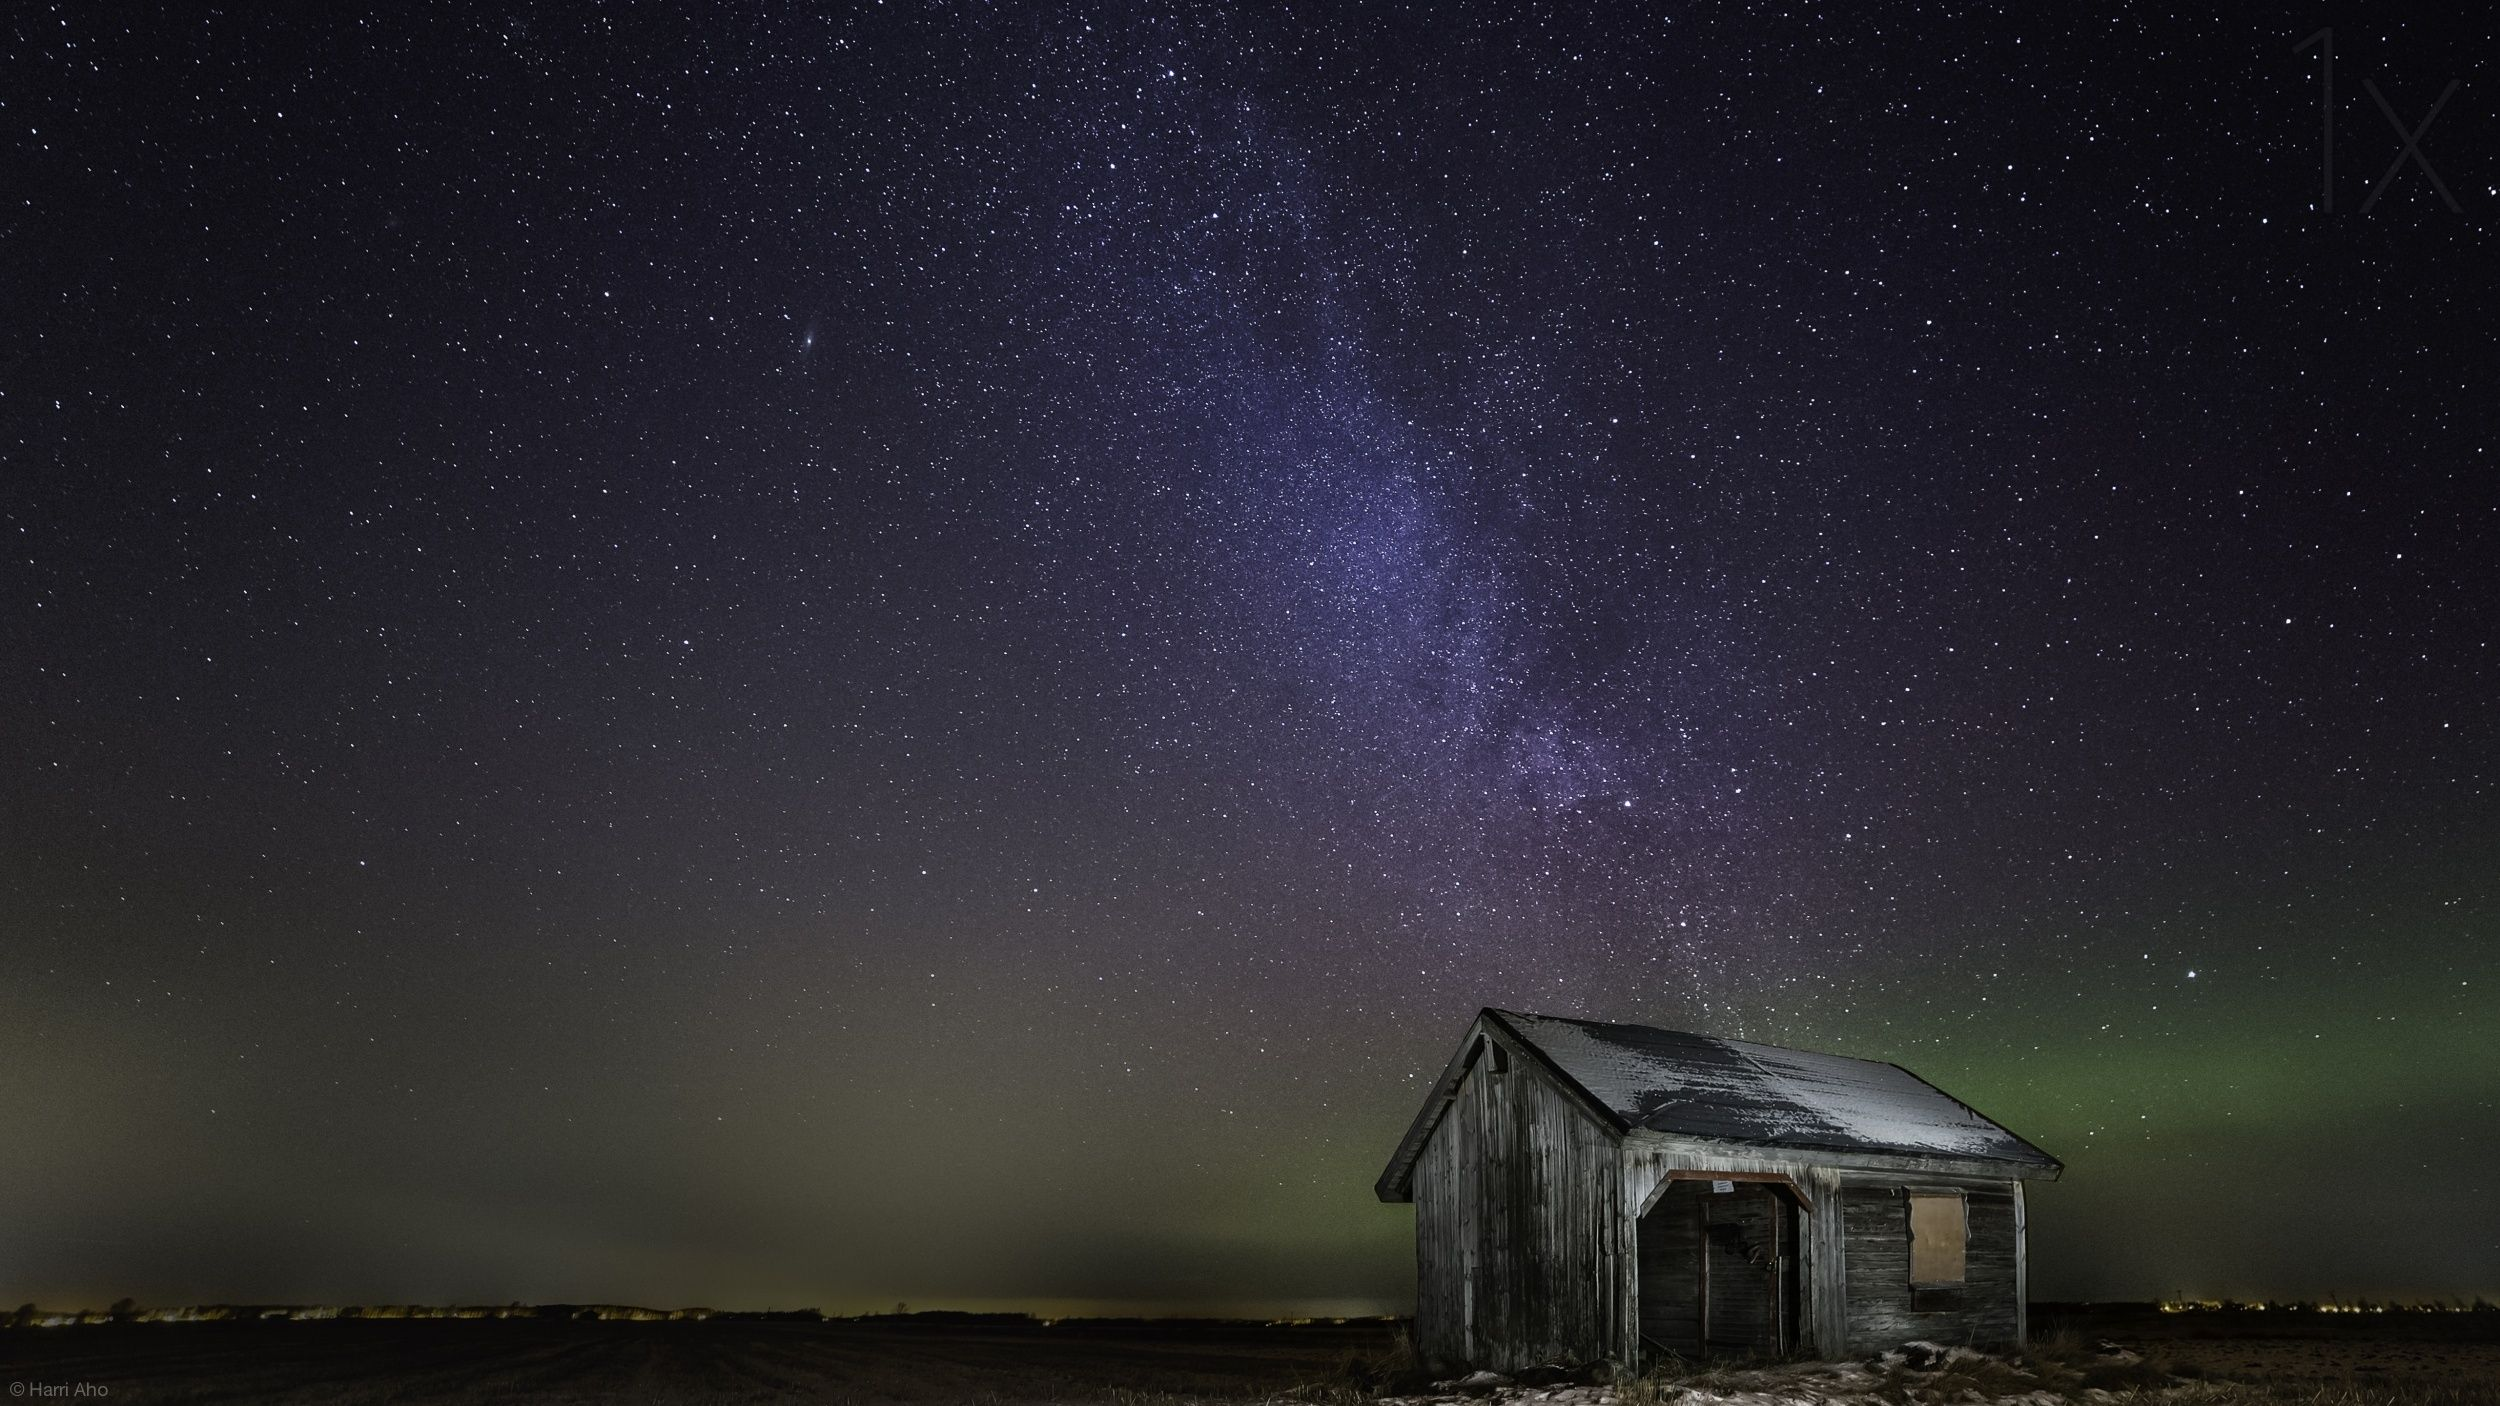 1X - Nasty light pollution by Harri Aho